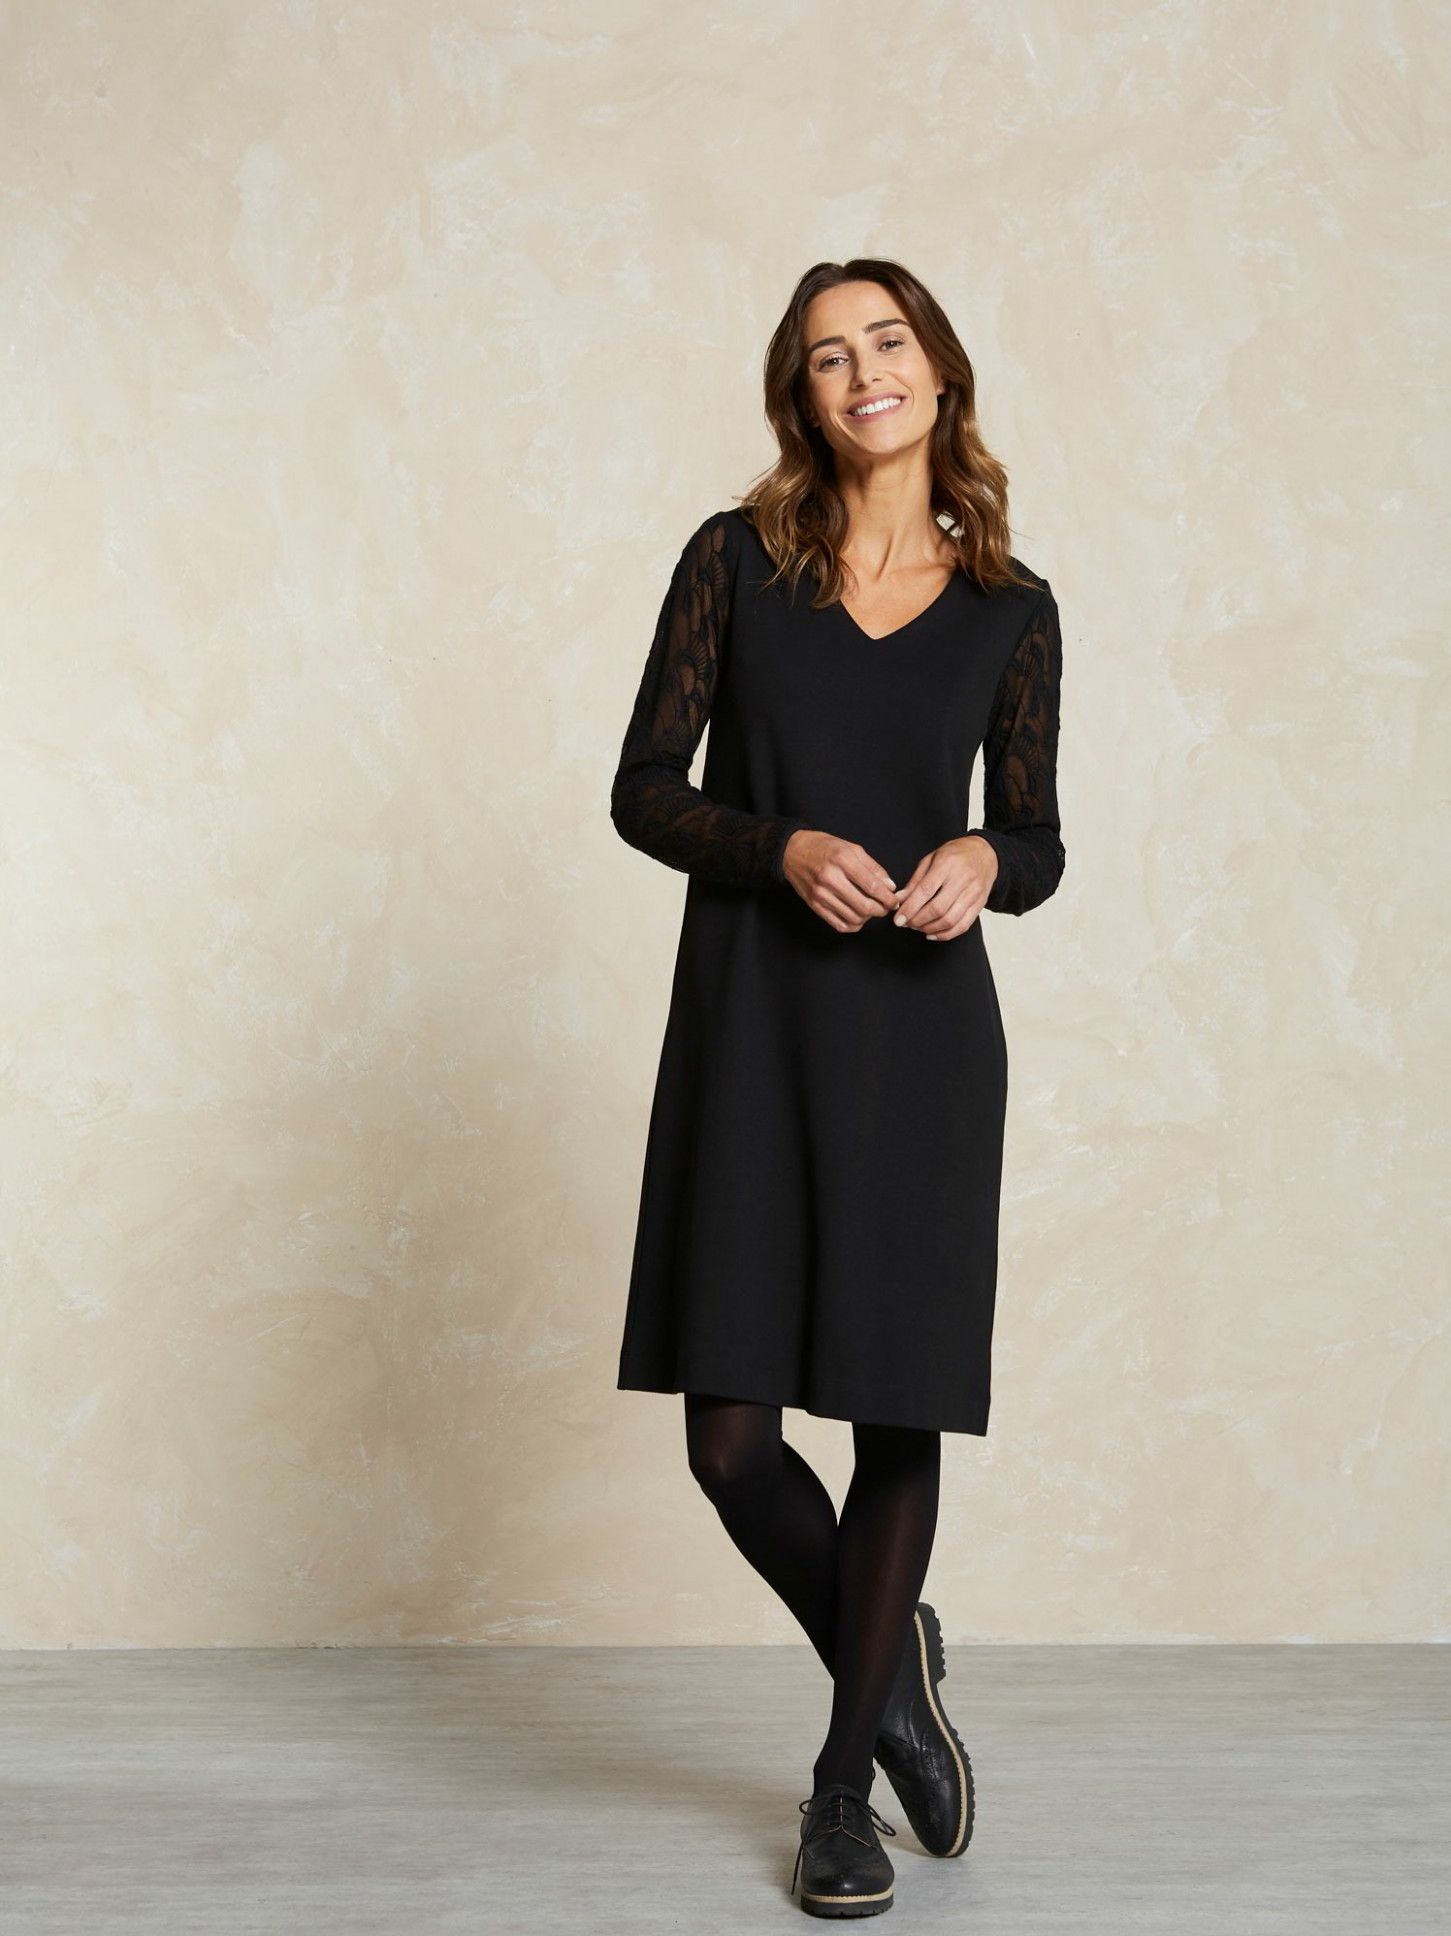 11 Langarm Kleid Schwarz In 2020 Langarm Kleid Schwarzes Kleid Langarm Kleider